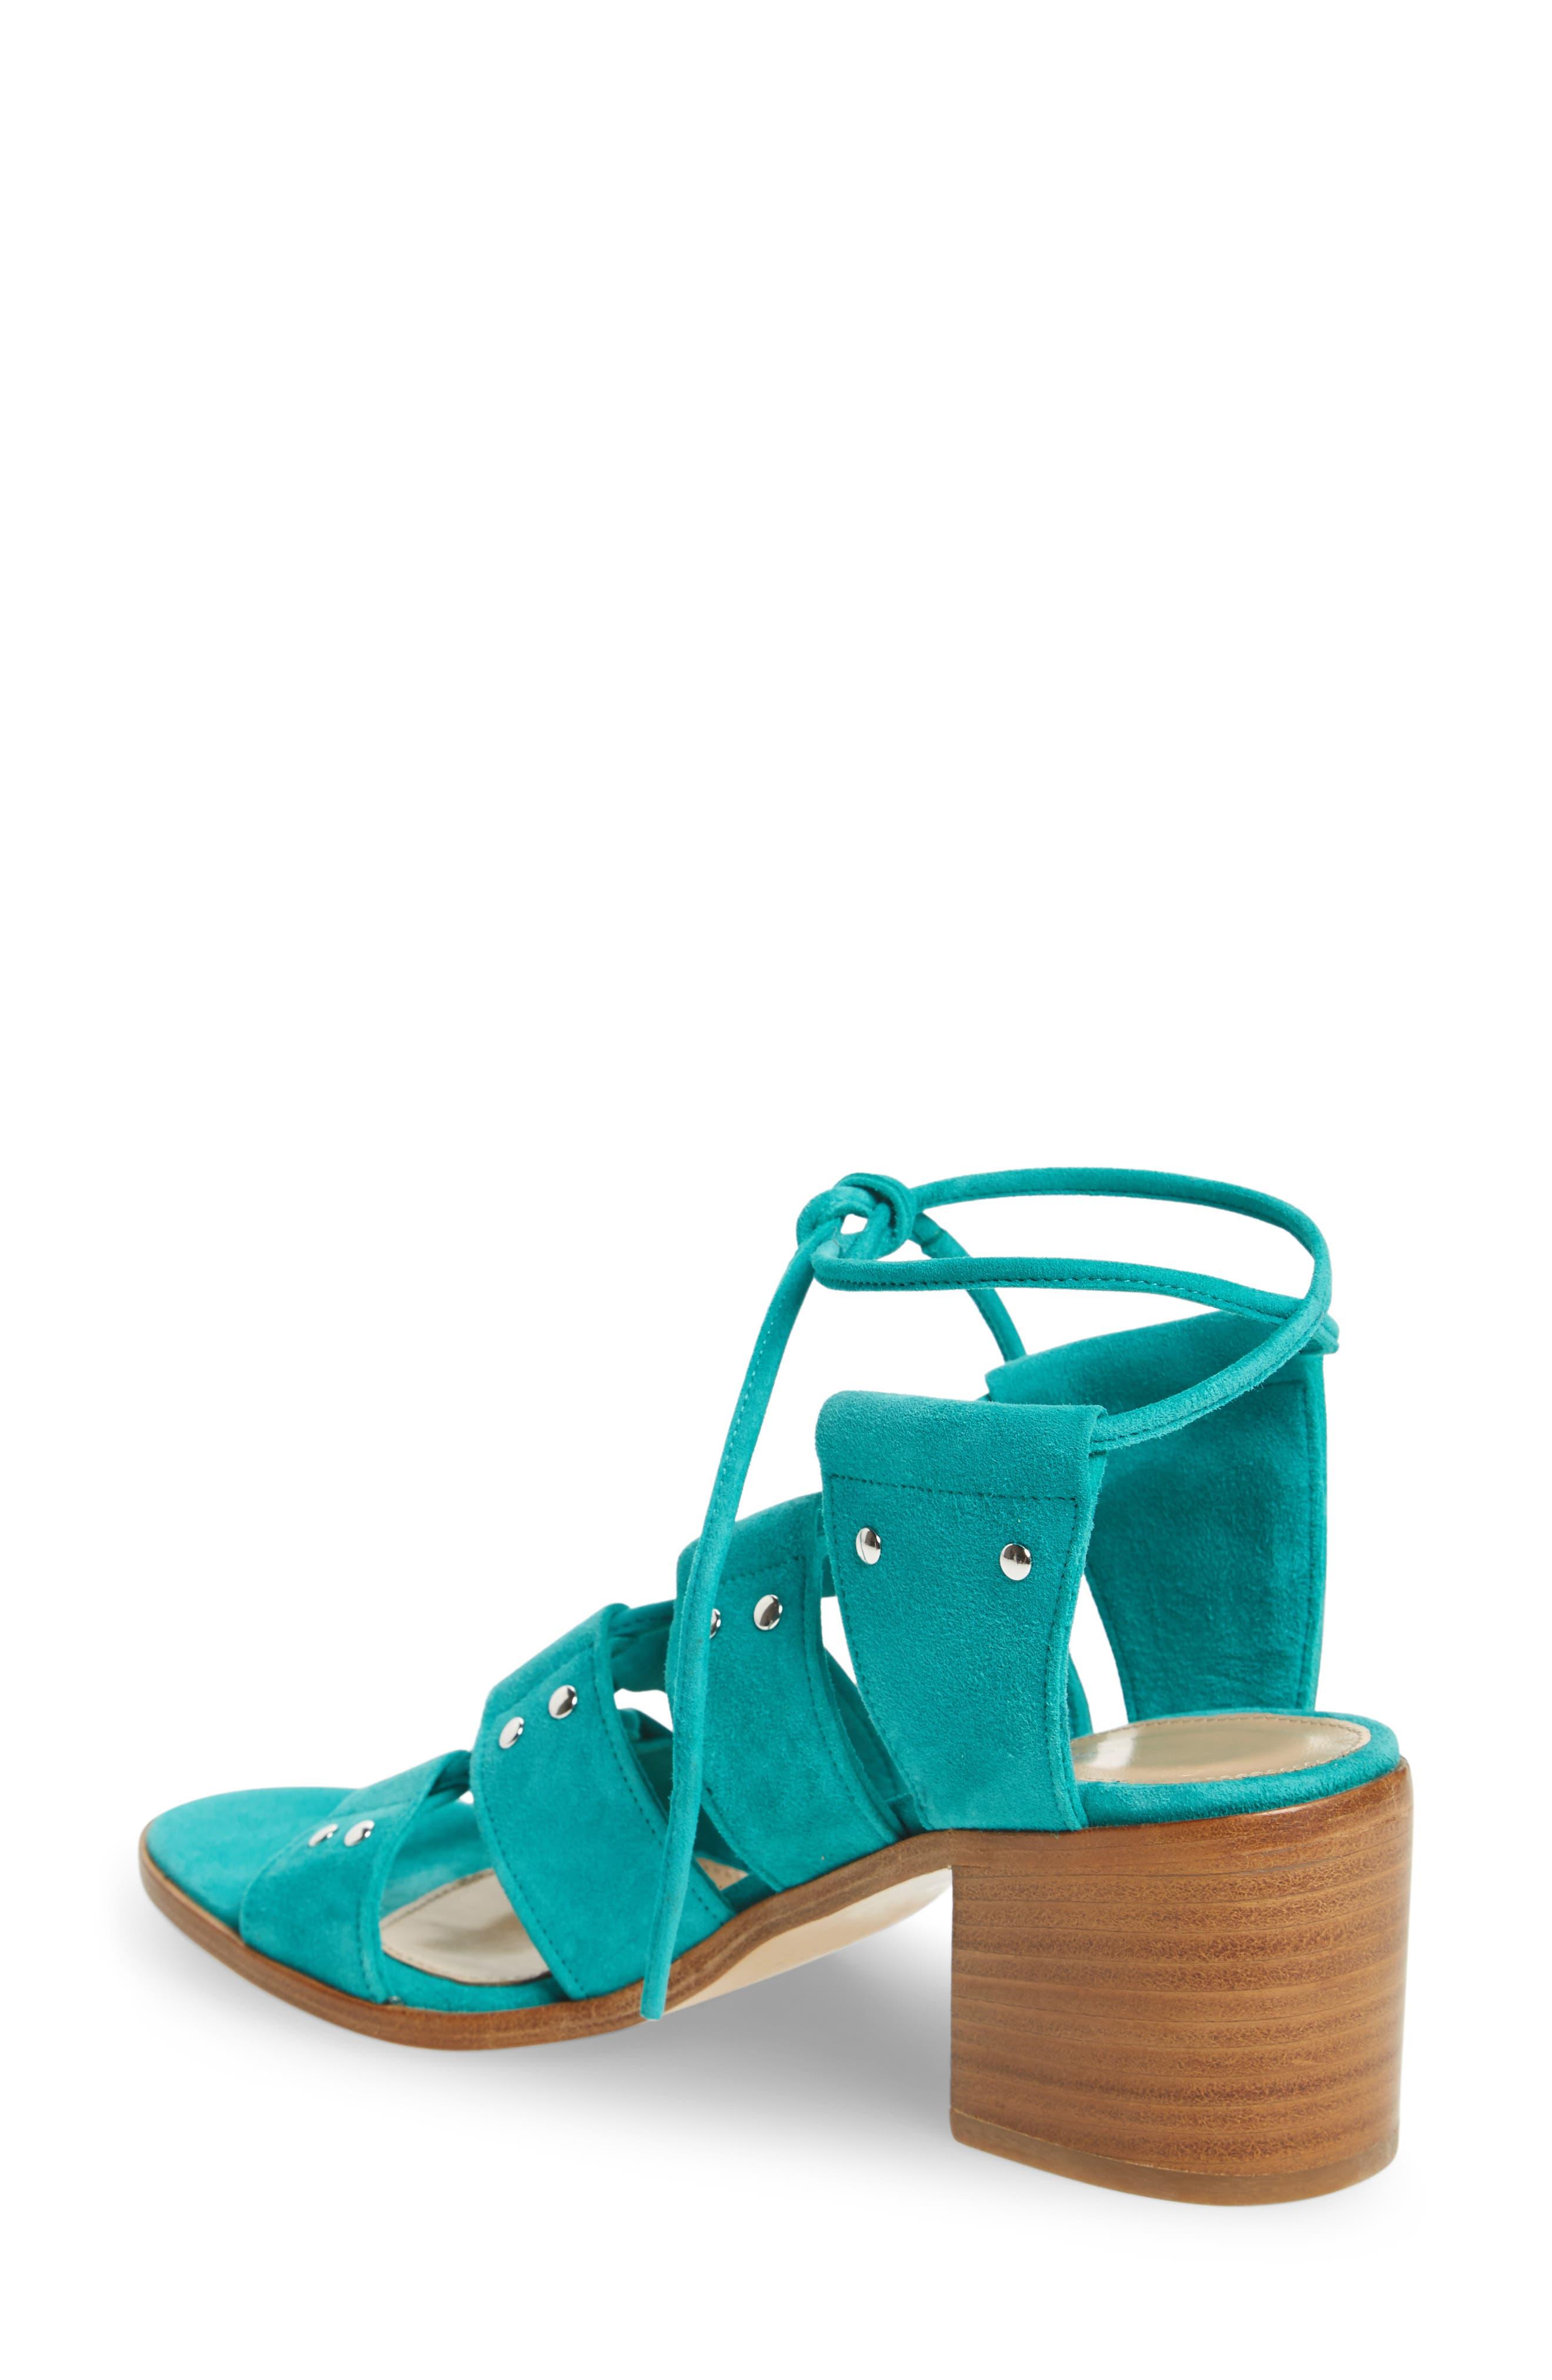 Birch Block Heel Sandal,                             Alternate thumbnail 7, color,